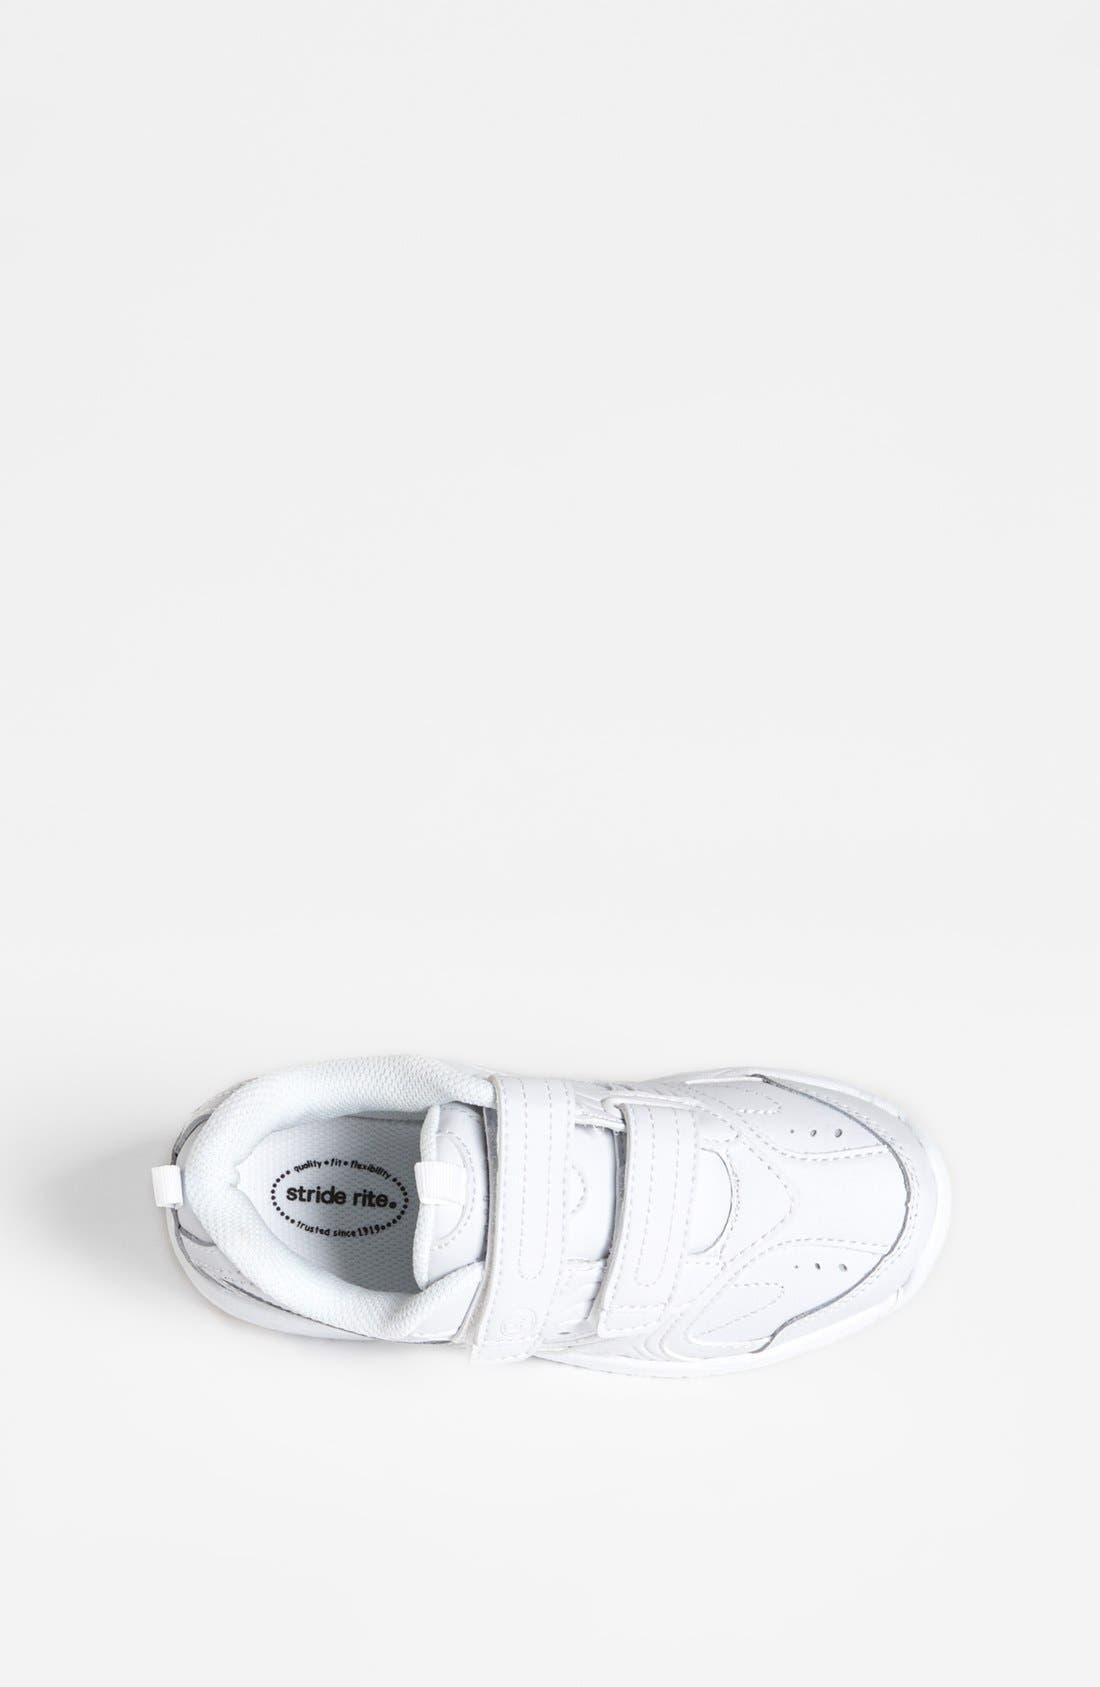 Alternate Image 3  - Stride Rite 'Cooper' Sneaker (Toddler, Little Kid & Big Kid)